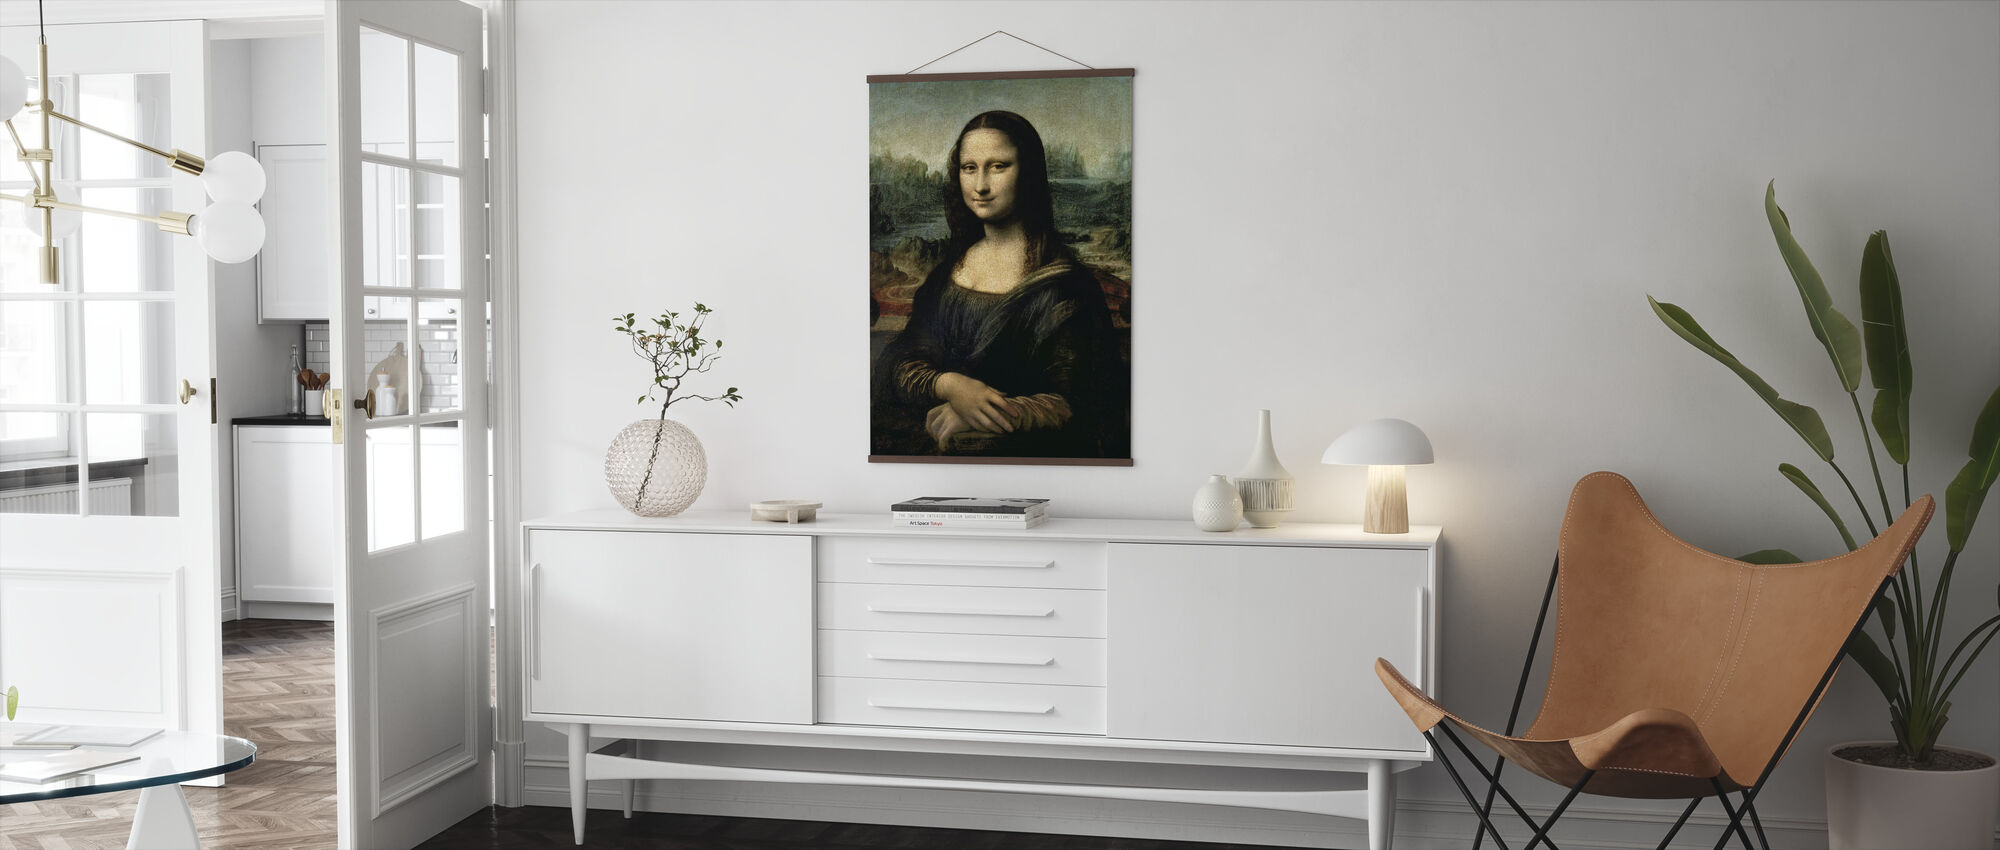 Mona Lisa, Leonardo da Vinci - Poster - Living Room